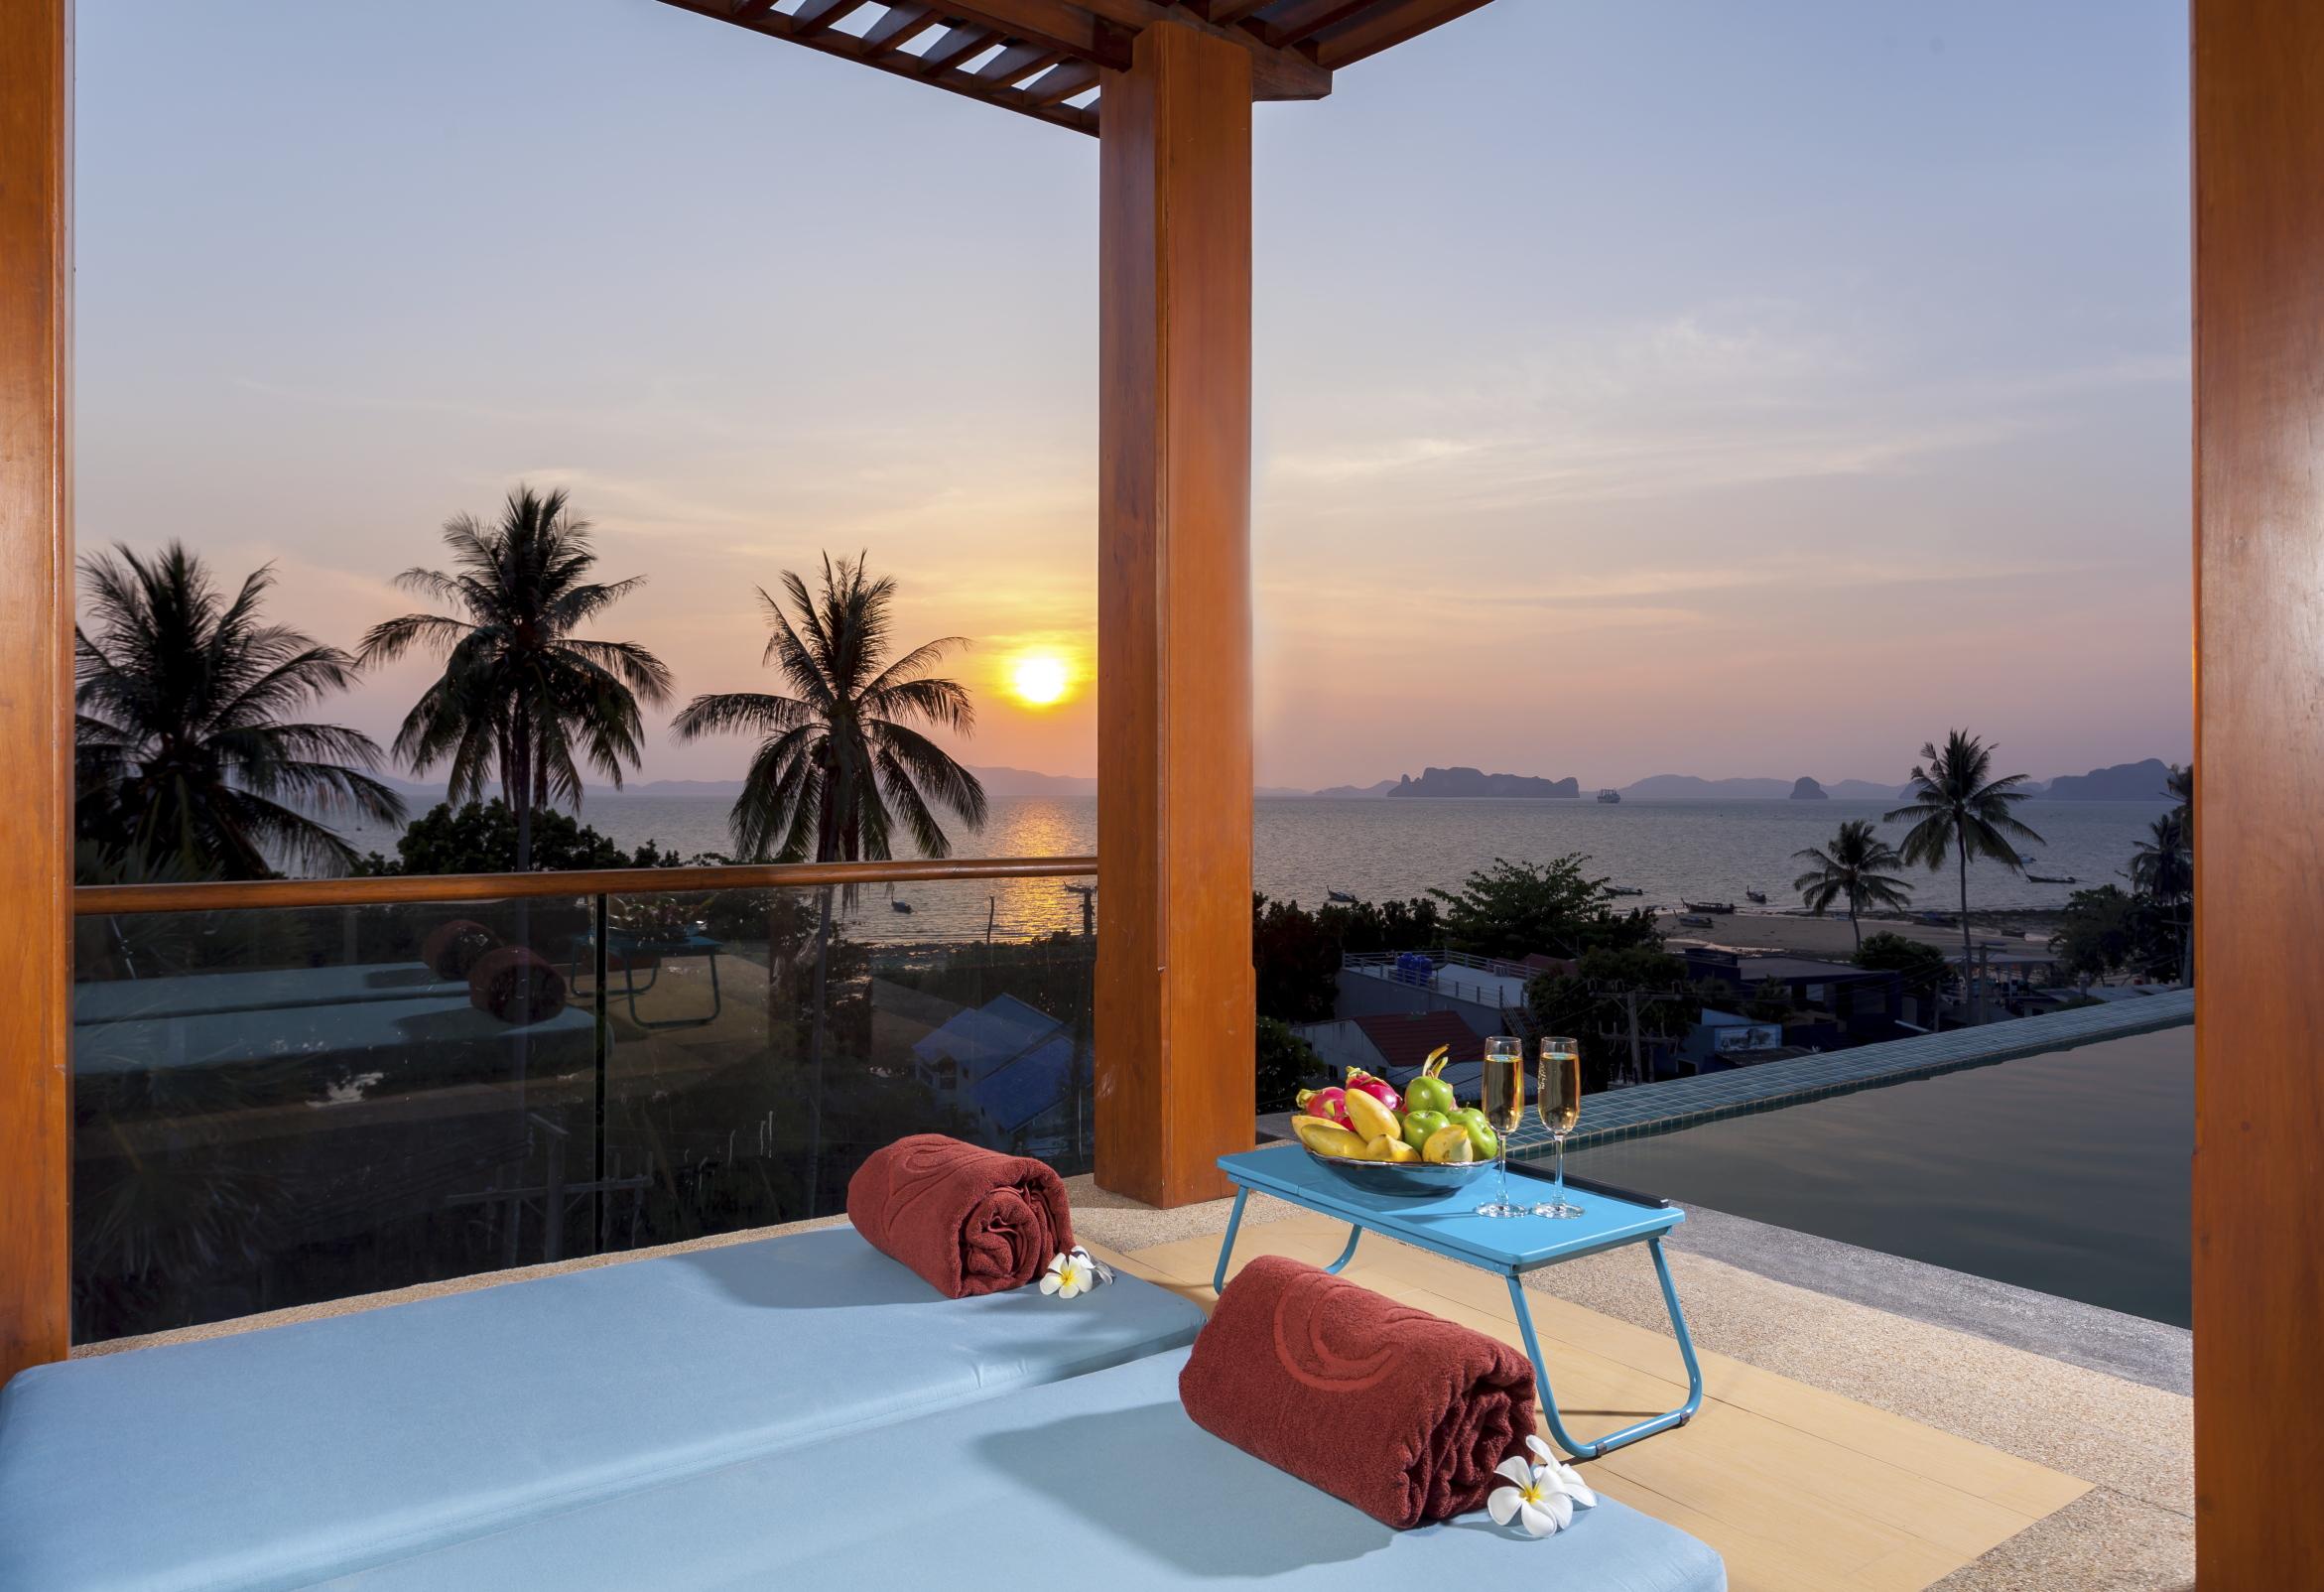 Centara Pelican Bay Residence & Suites Krabi - 2BR_Deluxe_poolsuite_penthouse